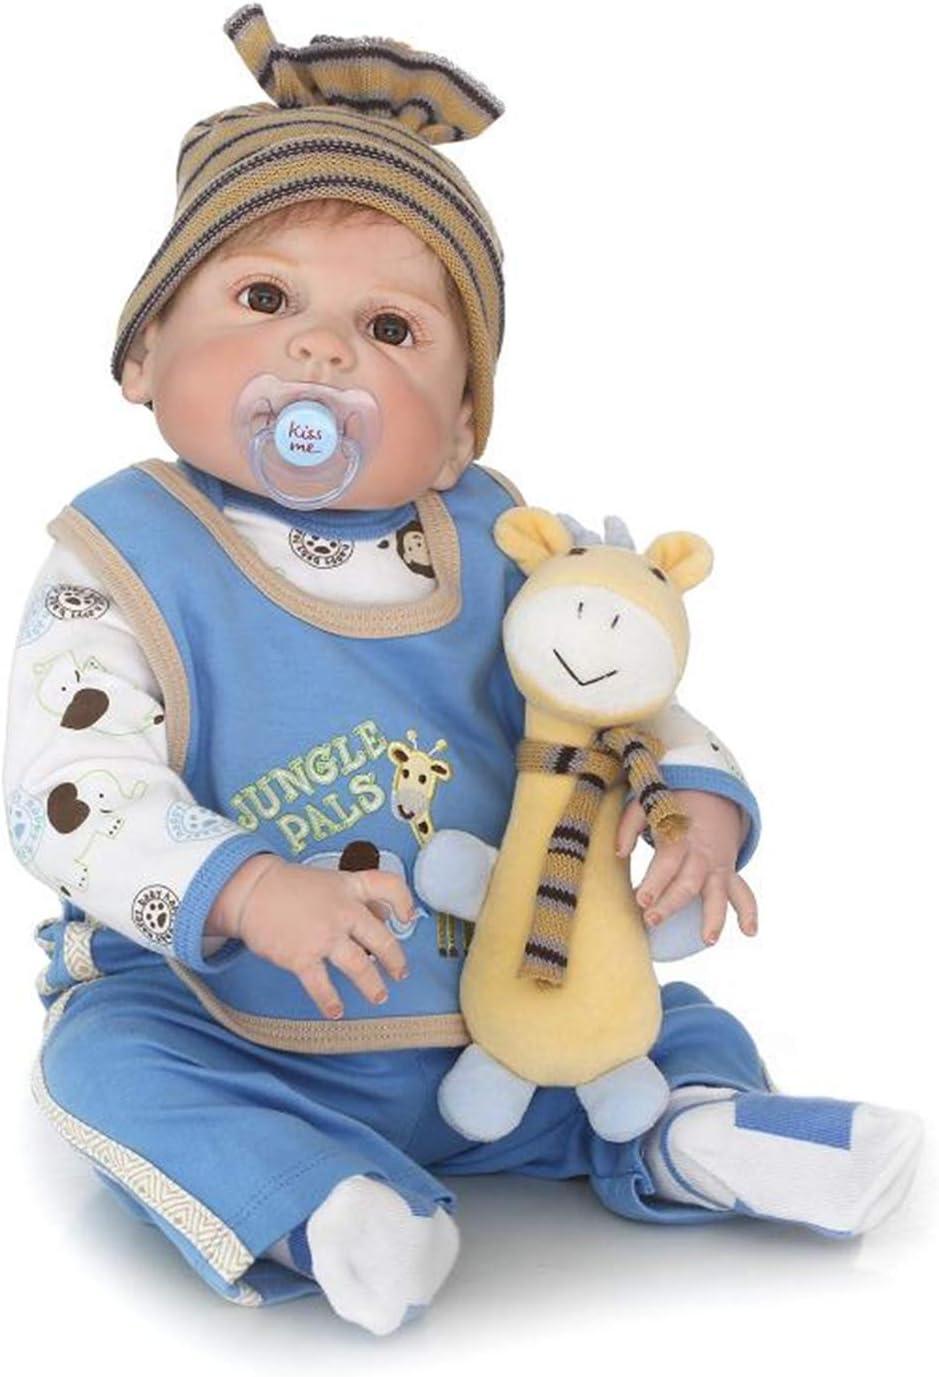 Zero Pam Binxing Toys Reborn Twins Dolls Boy/&Girl Preemie Silicone Babies Newborn Dolls 18 inch Soft Handmade Real Life Reborn Baby Dolls for Twins